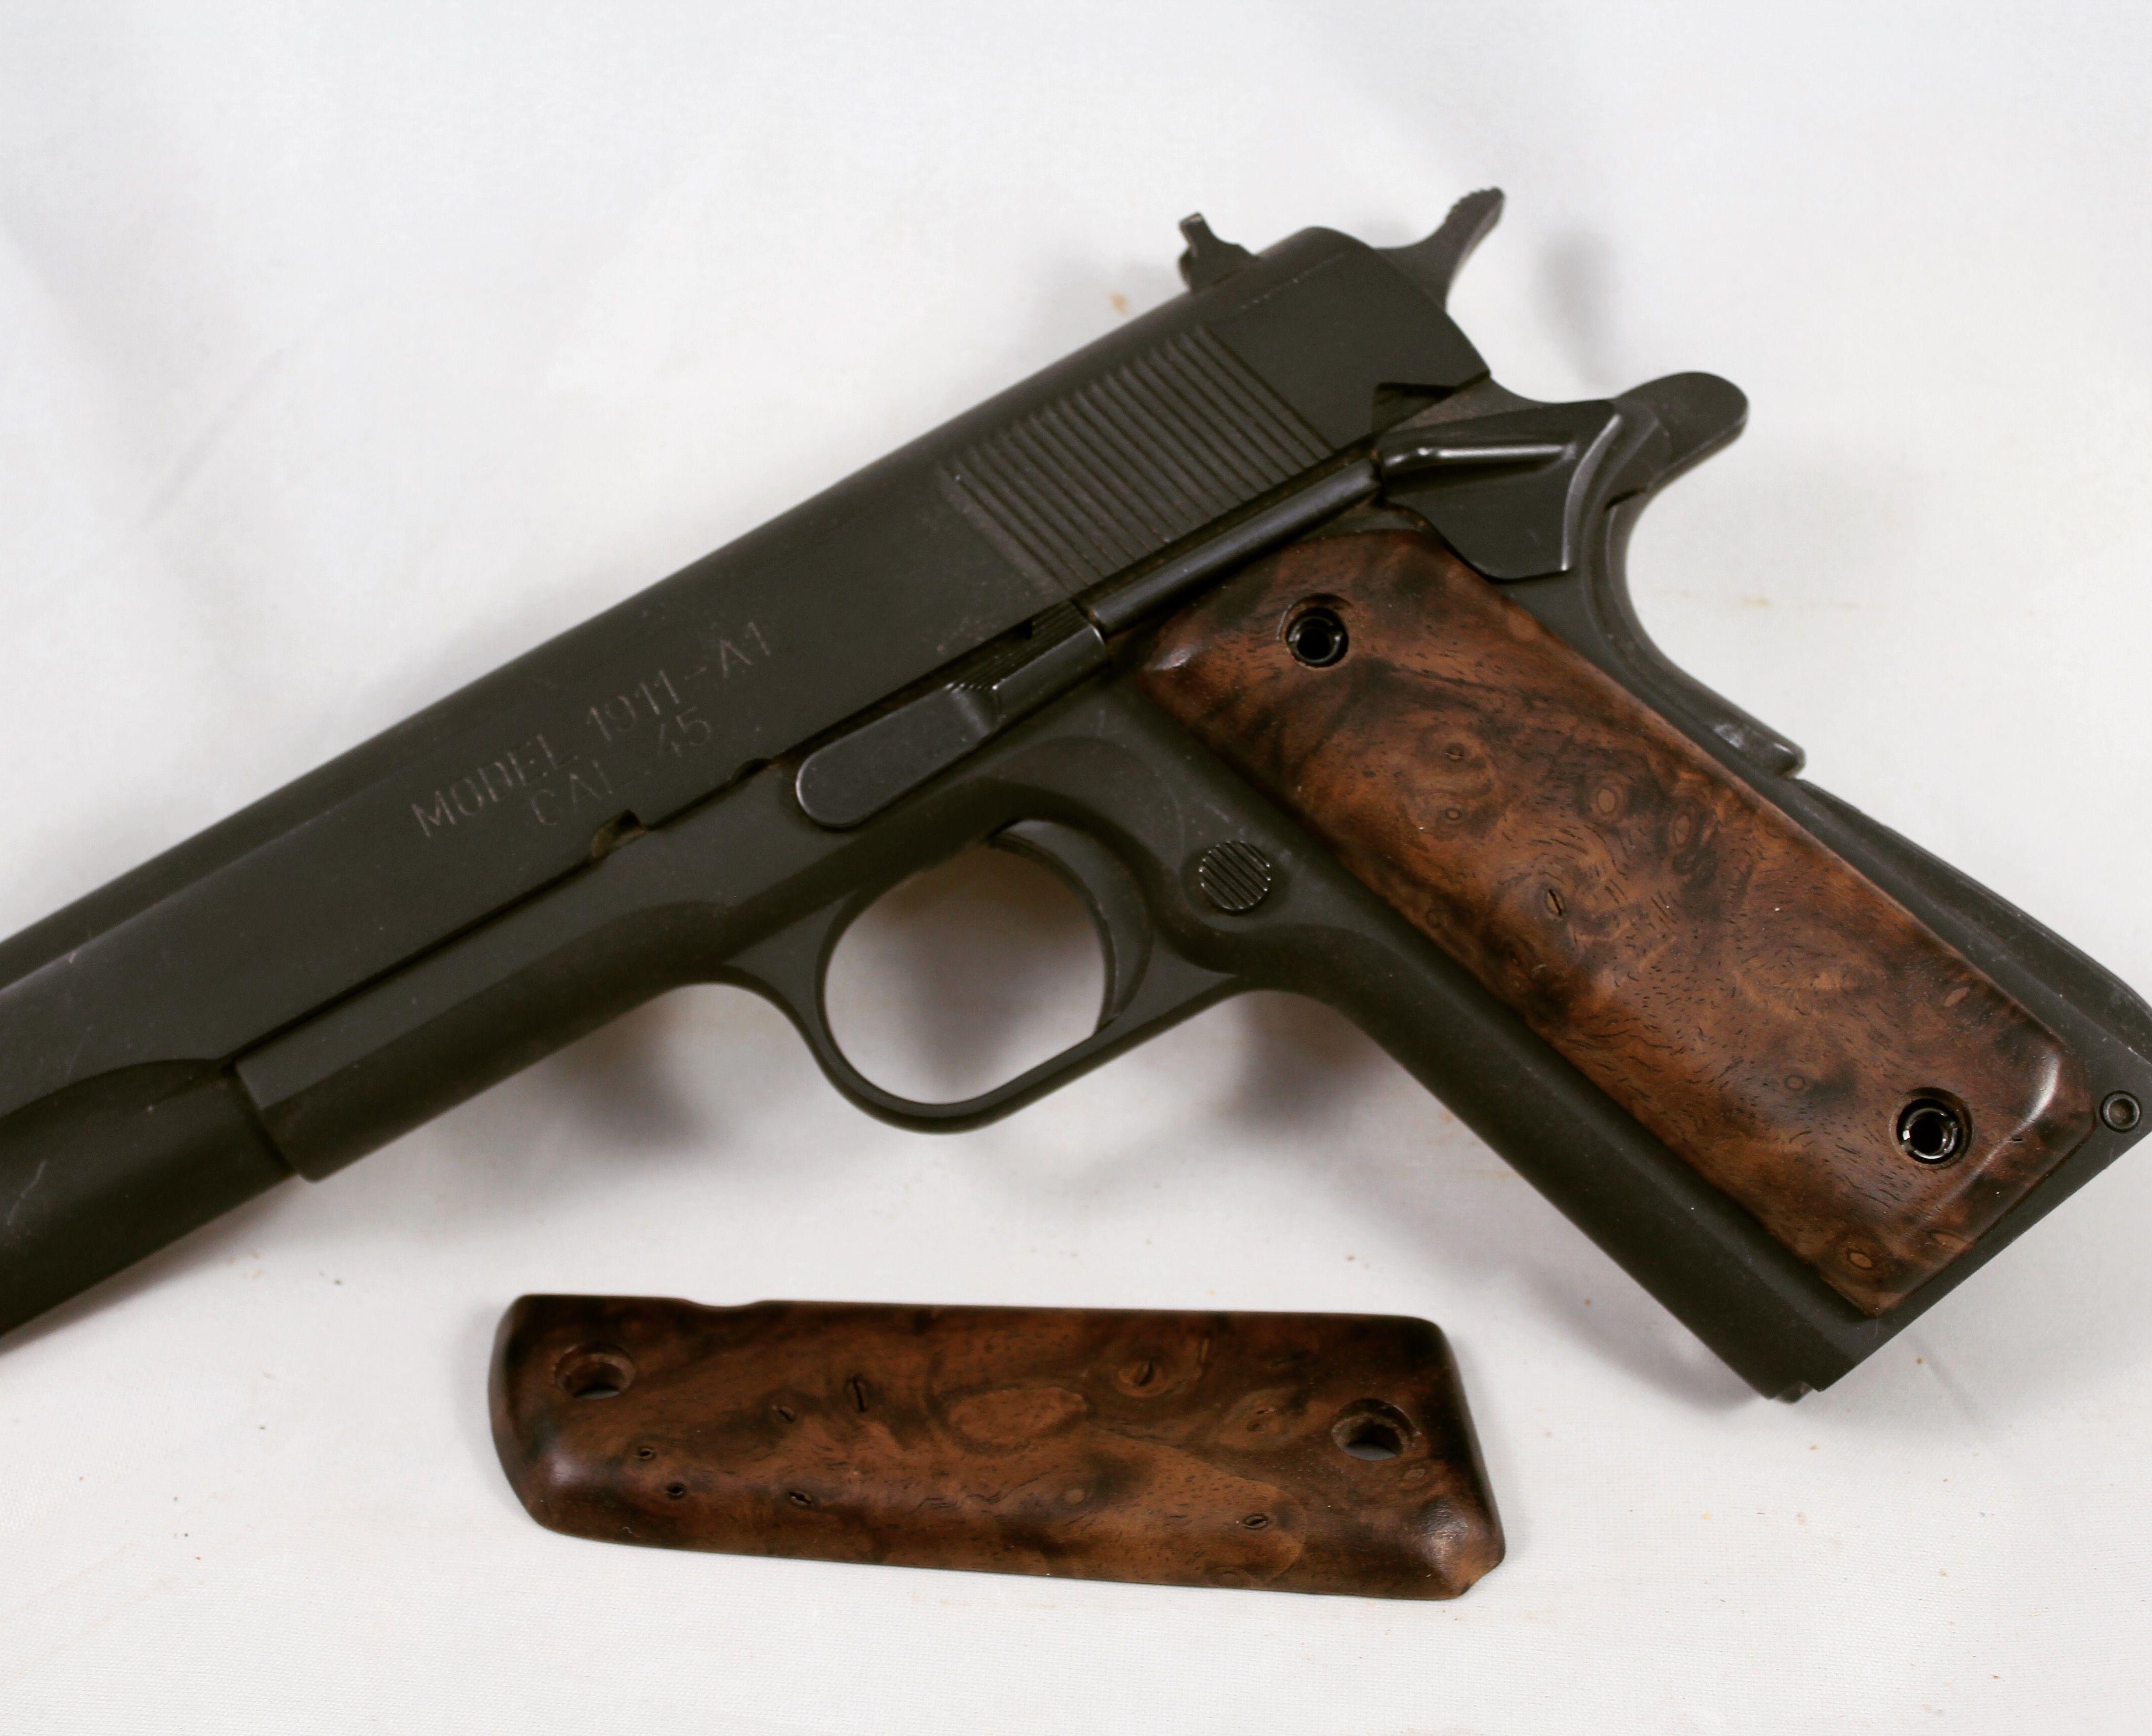 Walnut wood grips  Forsale gun guns custom wood 1911 survival